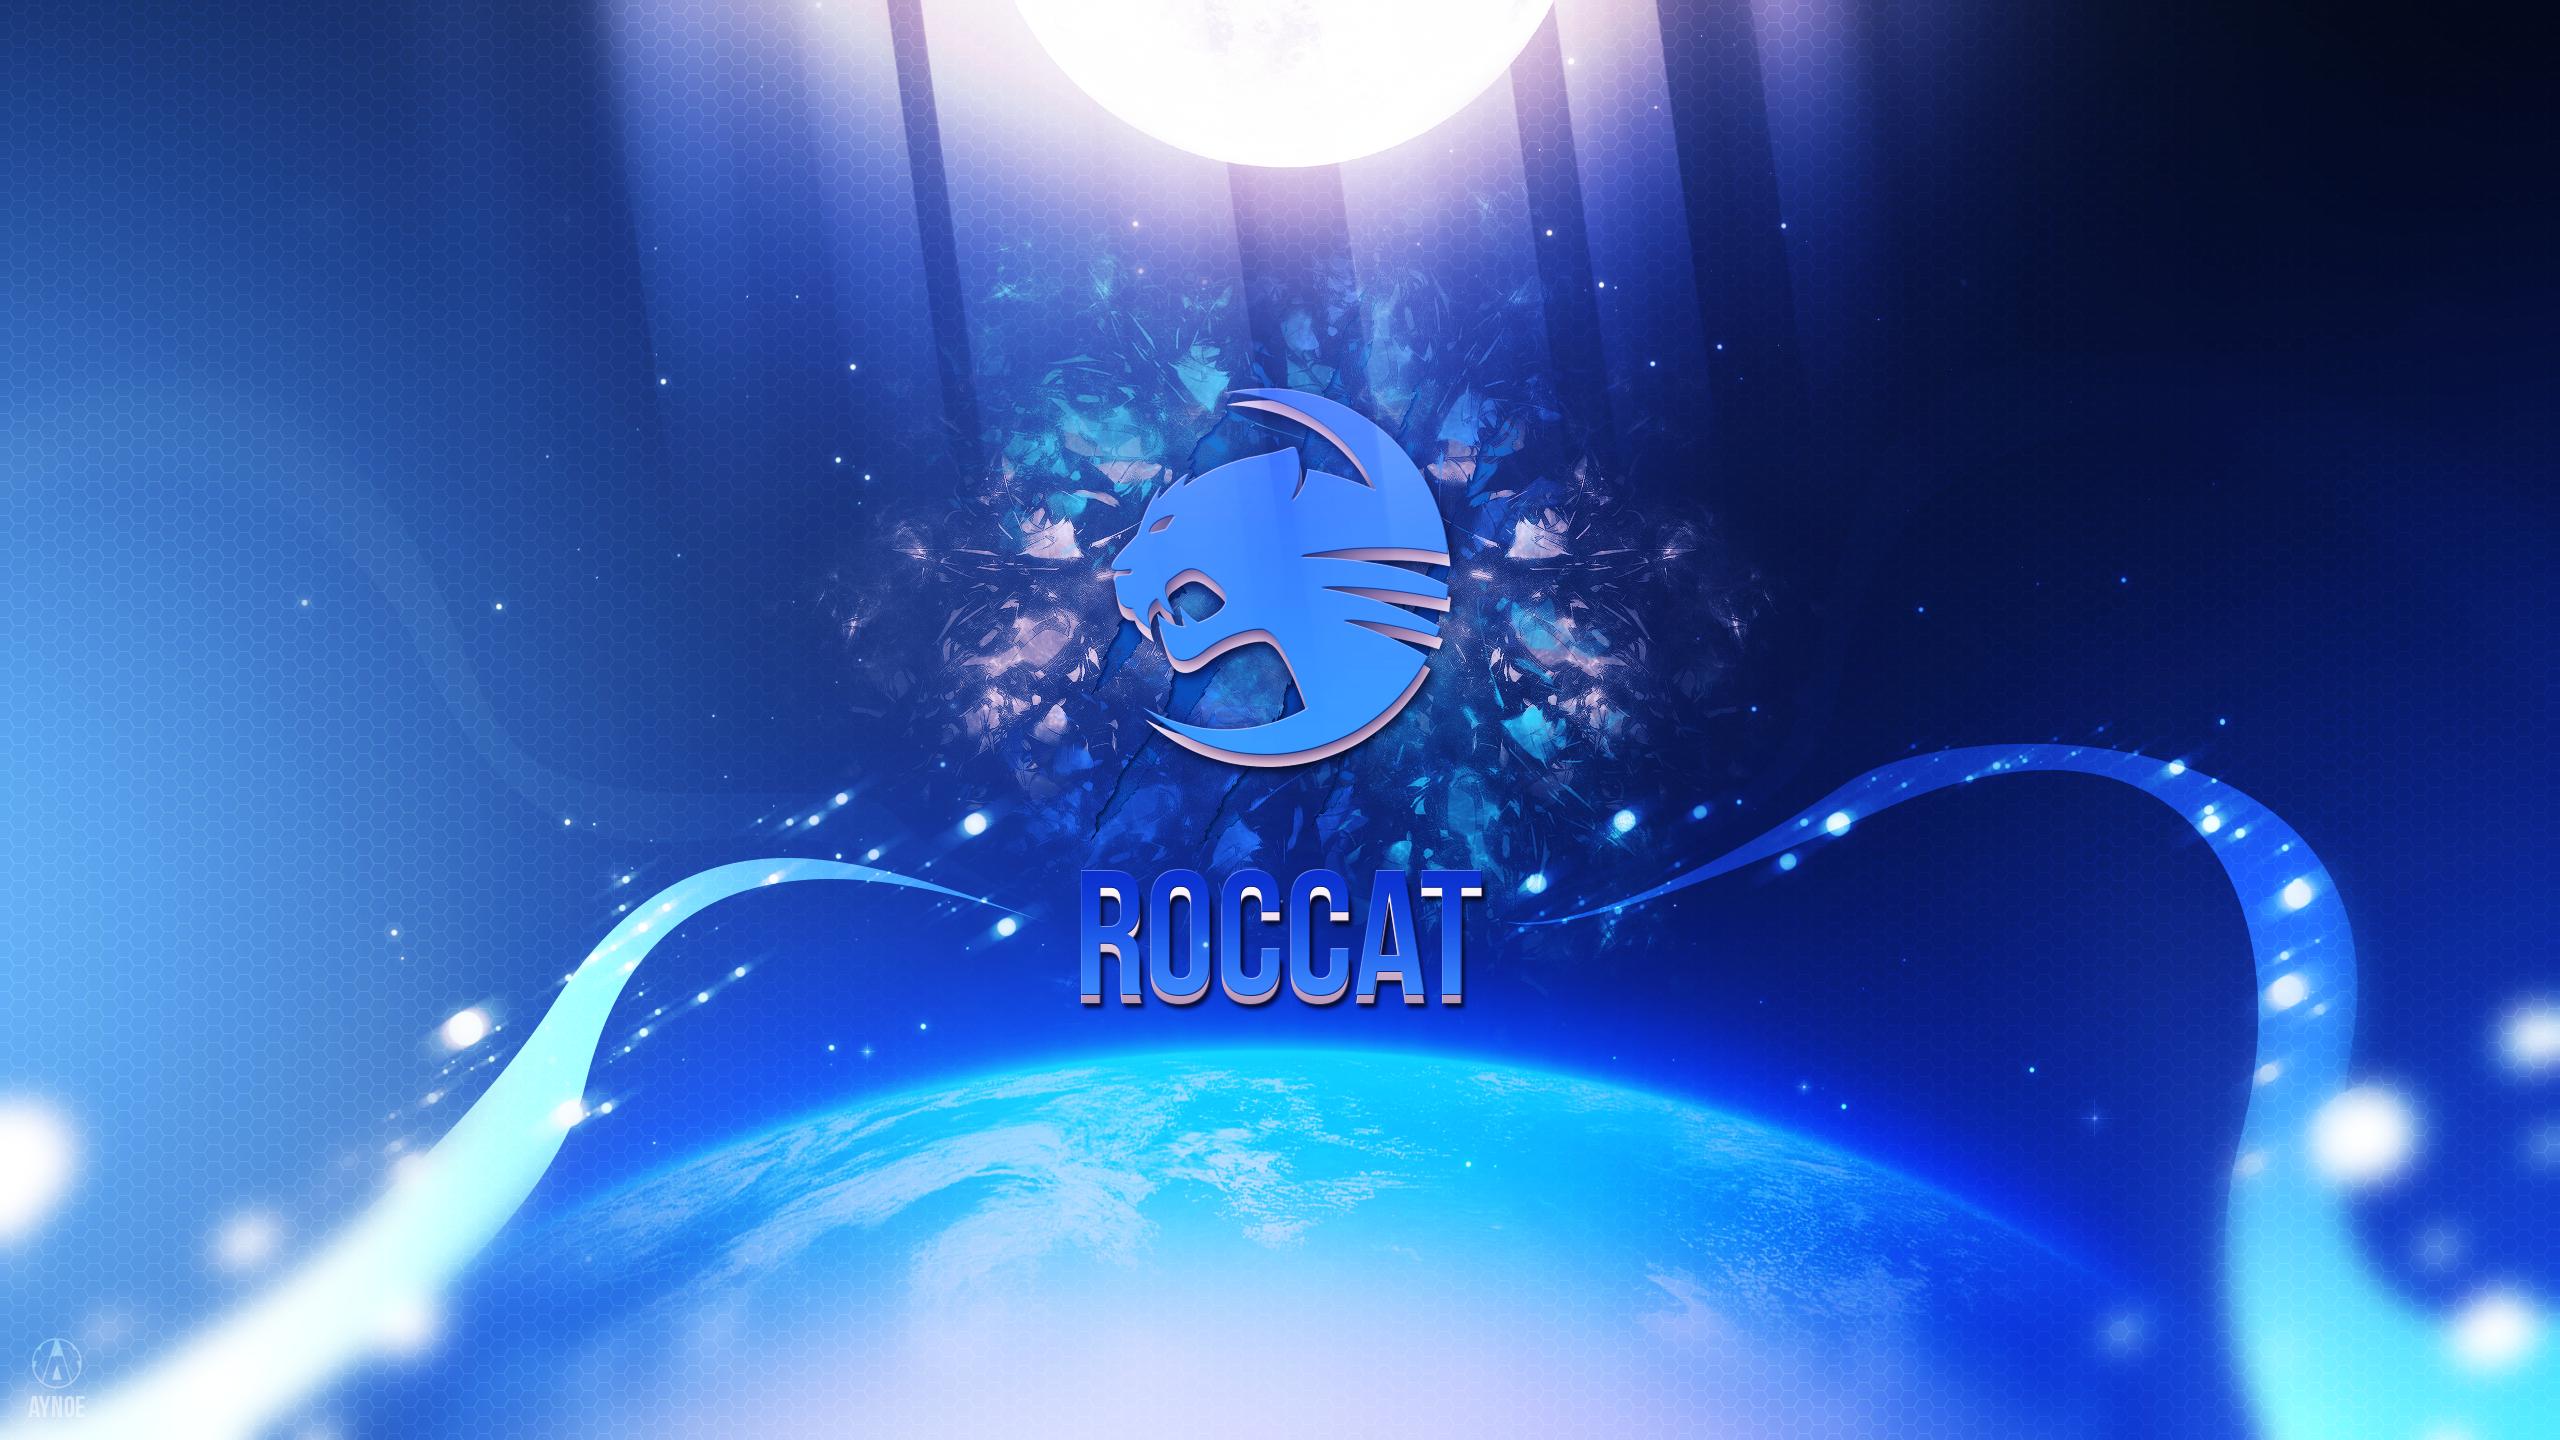 download roccat logo wallpaper -#main